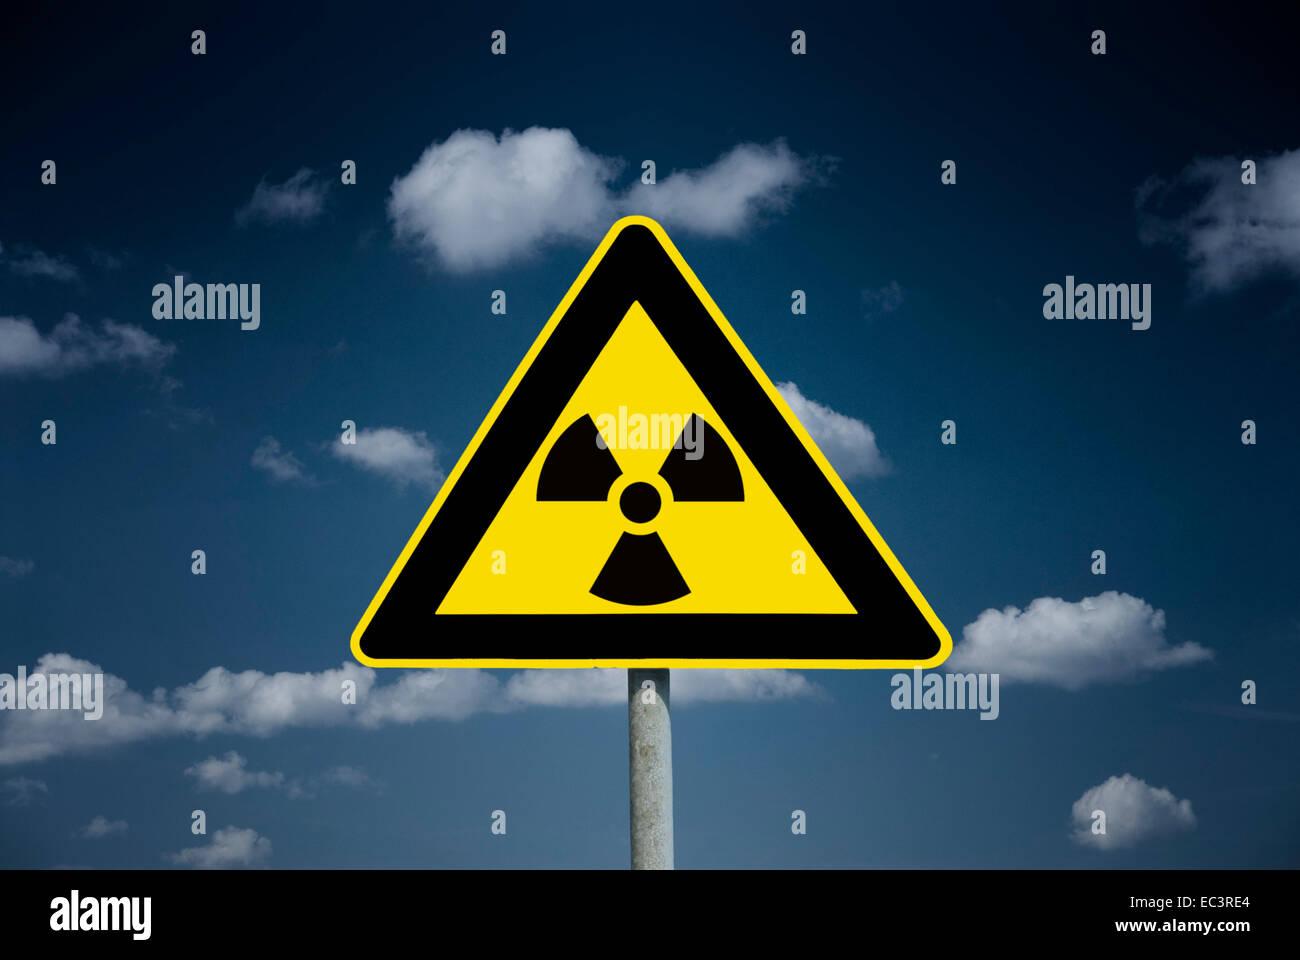 Radiation warning sign, radioactive cloud - Stock Image